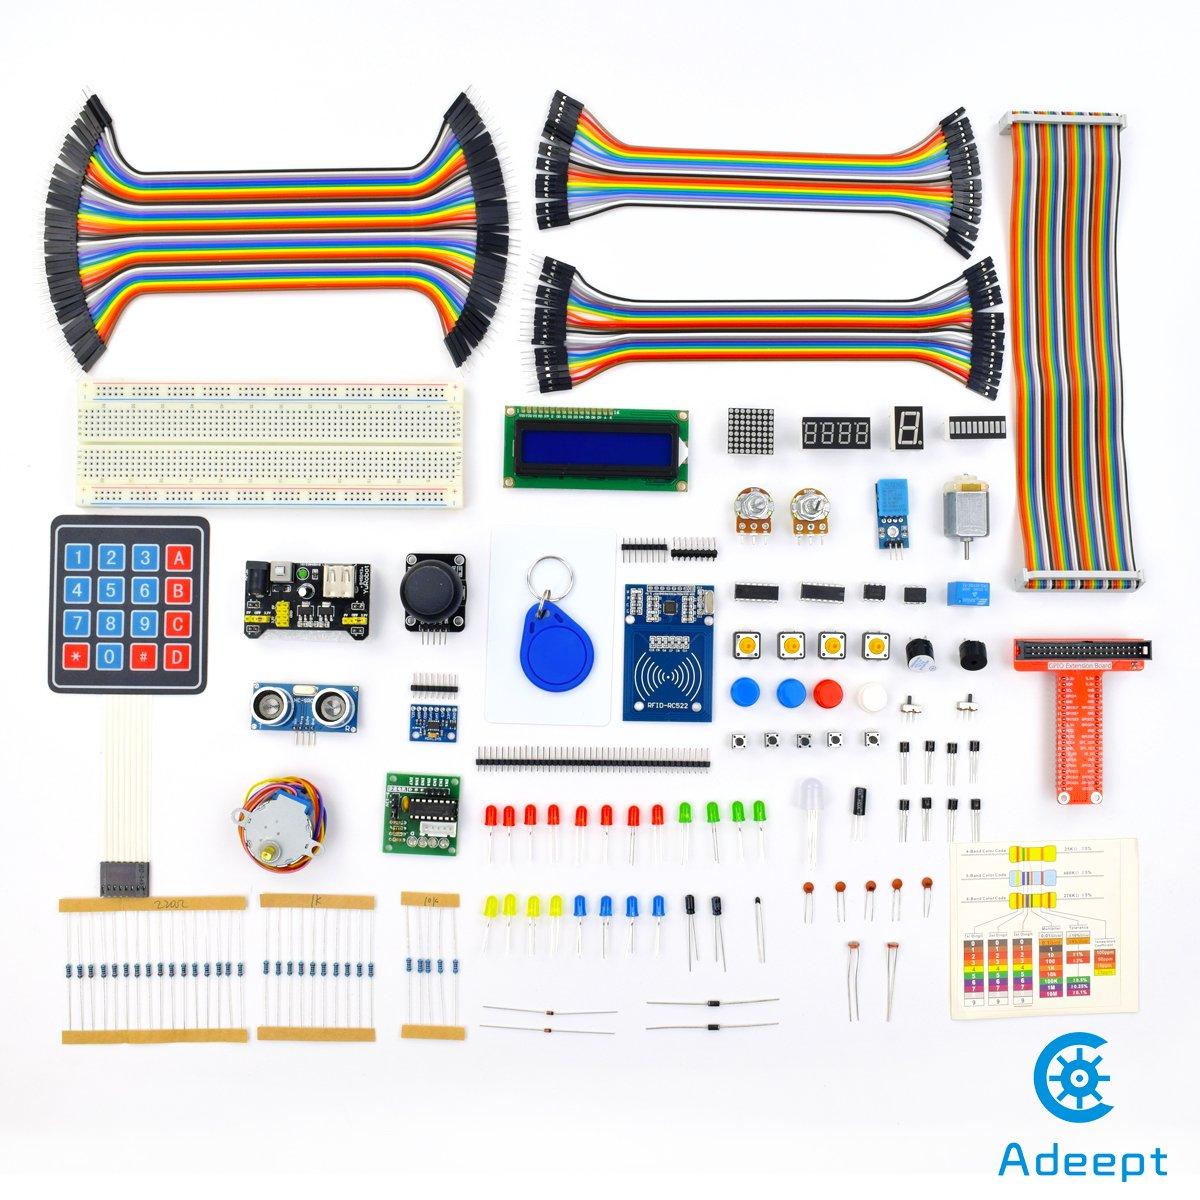 Adeept Rfid Starter Kit For Raspberry Pi 3 2 Model B Stepper Wiringpi Spi Write Motor Adxl345 40 Pin Gpio Extension Board With C And Python Code Beginner Learning